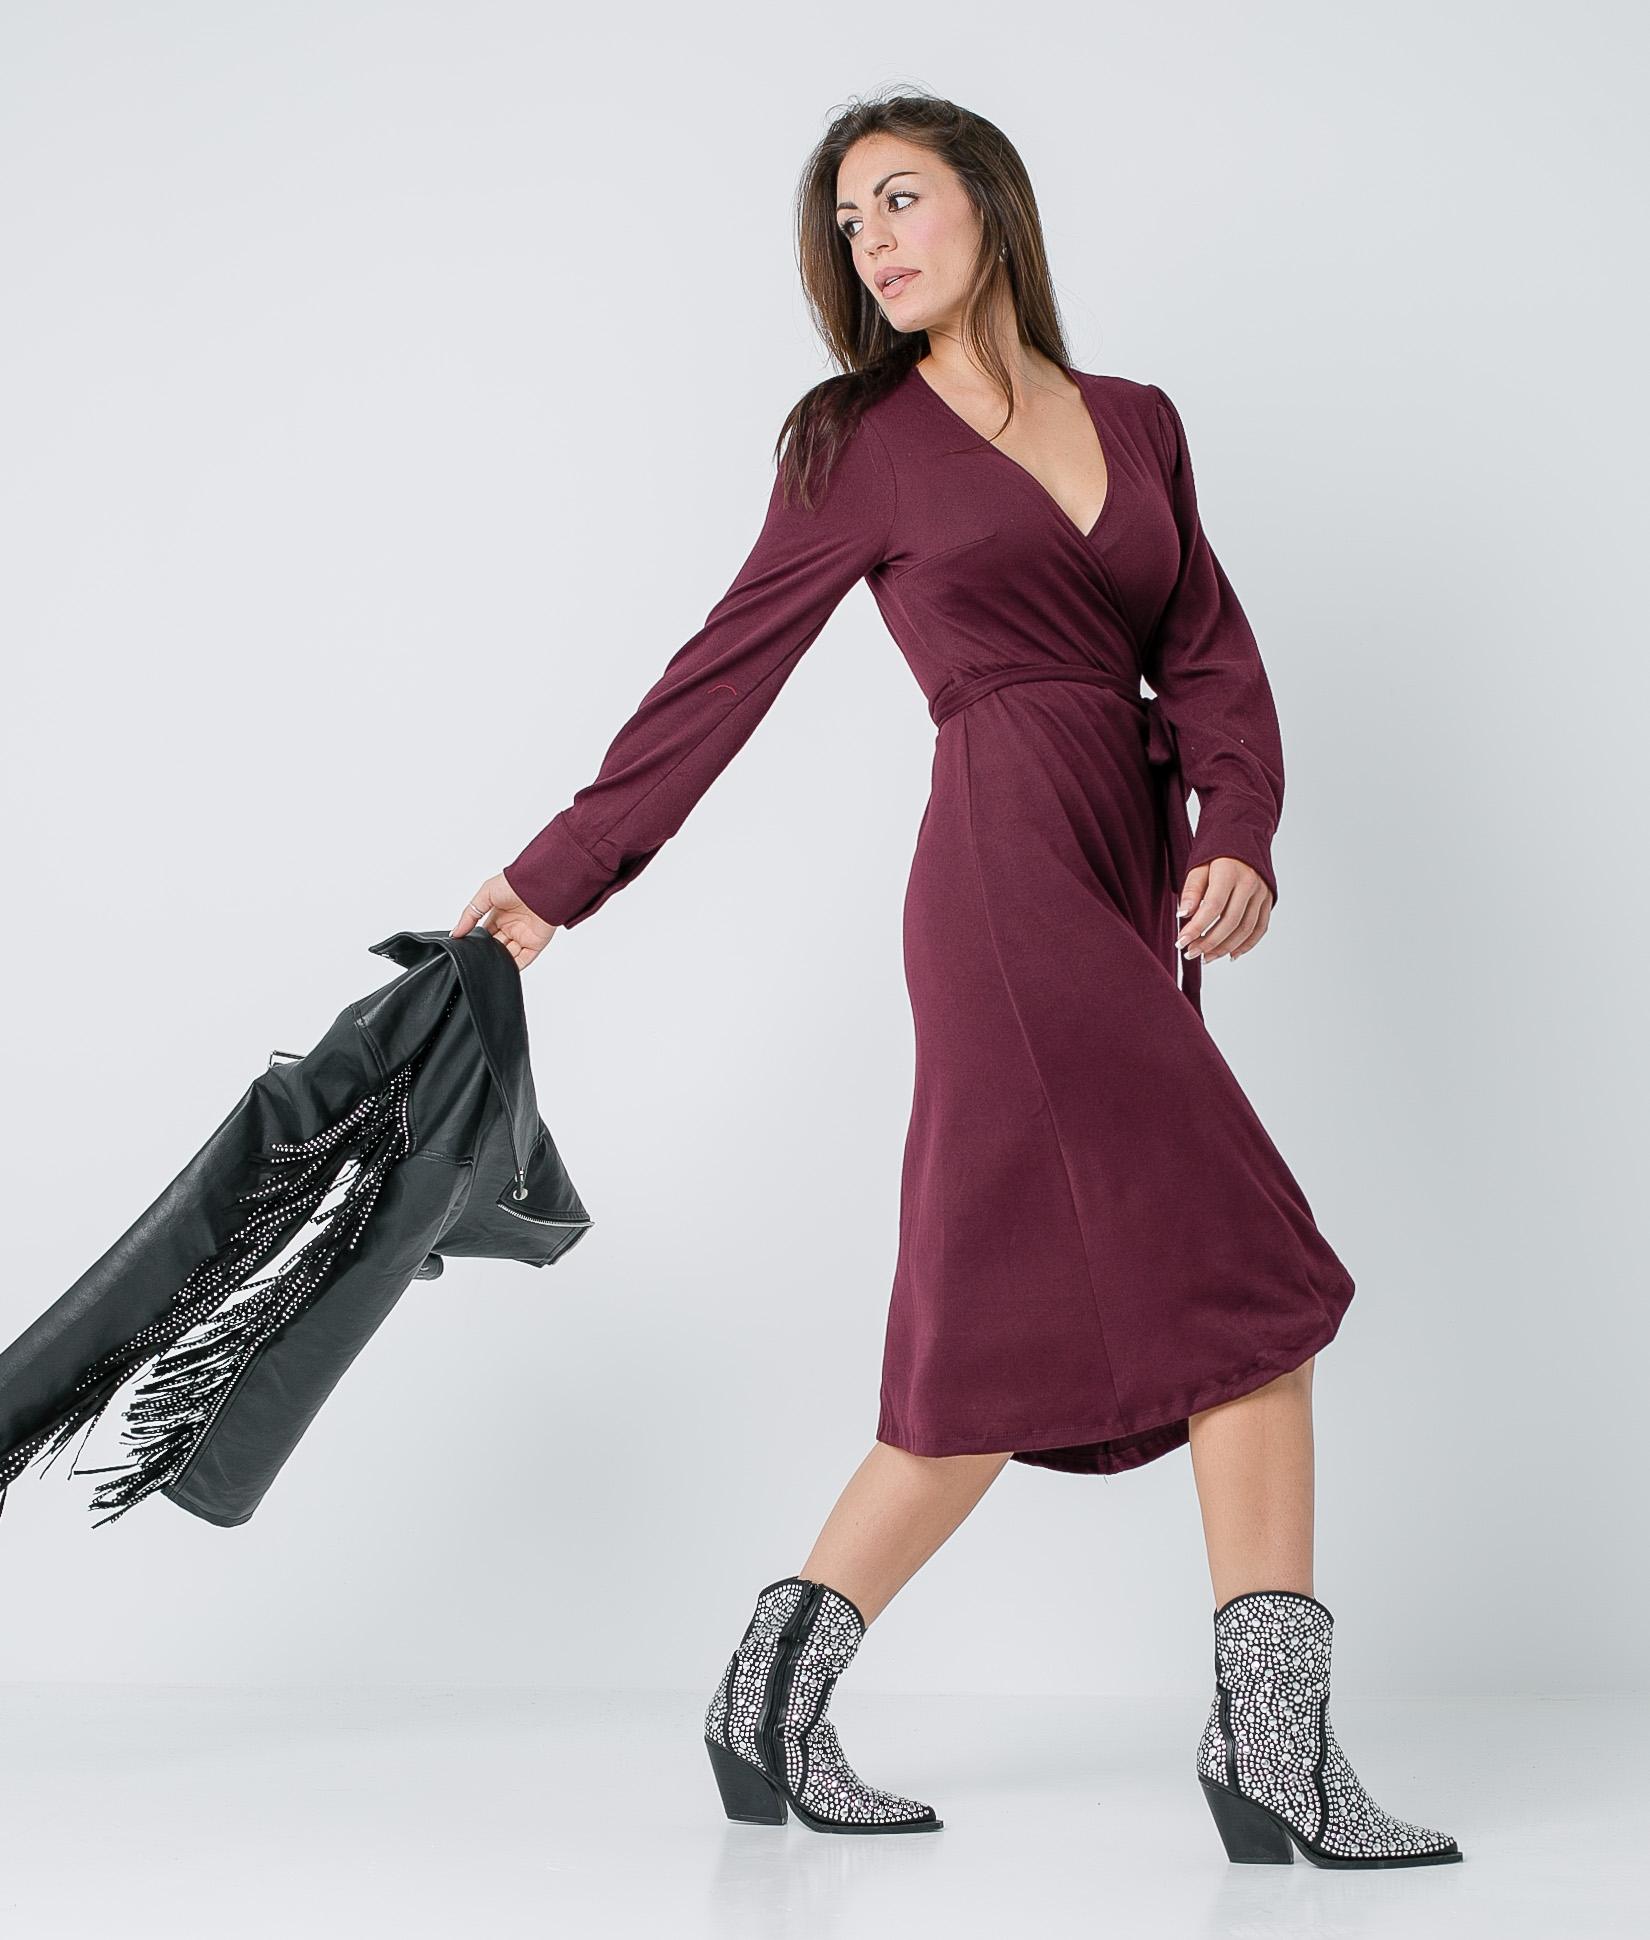 EVALY DRESS - MAROON